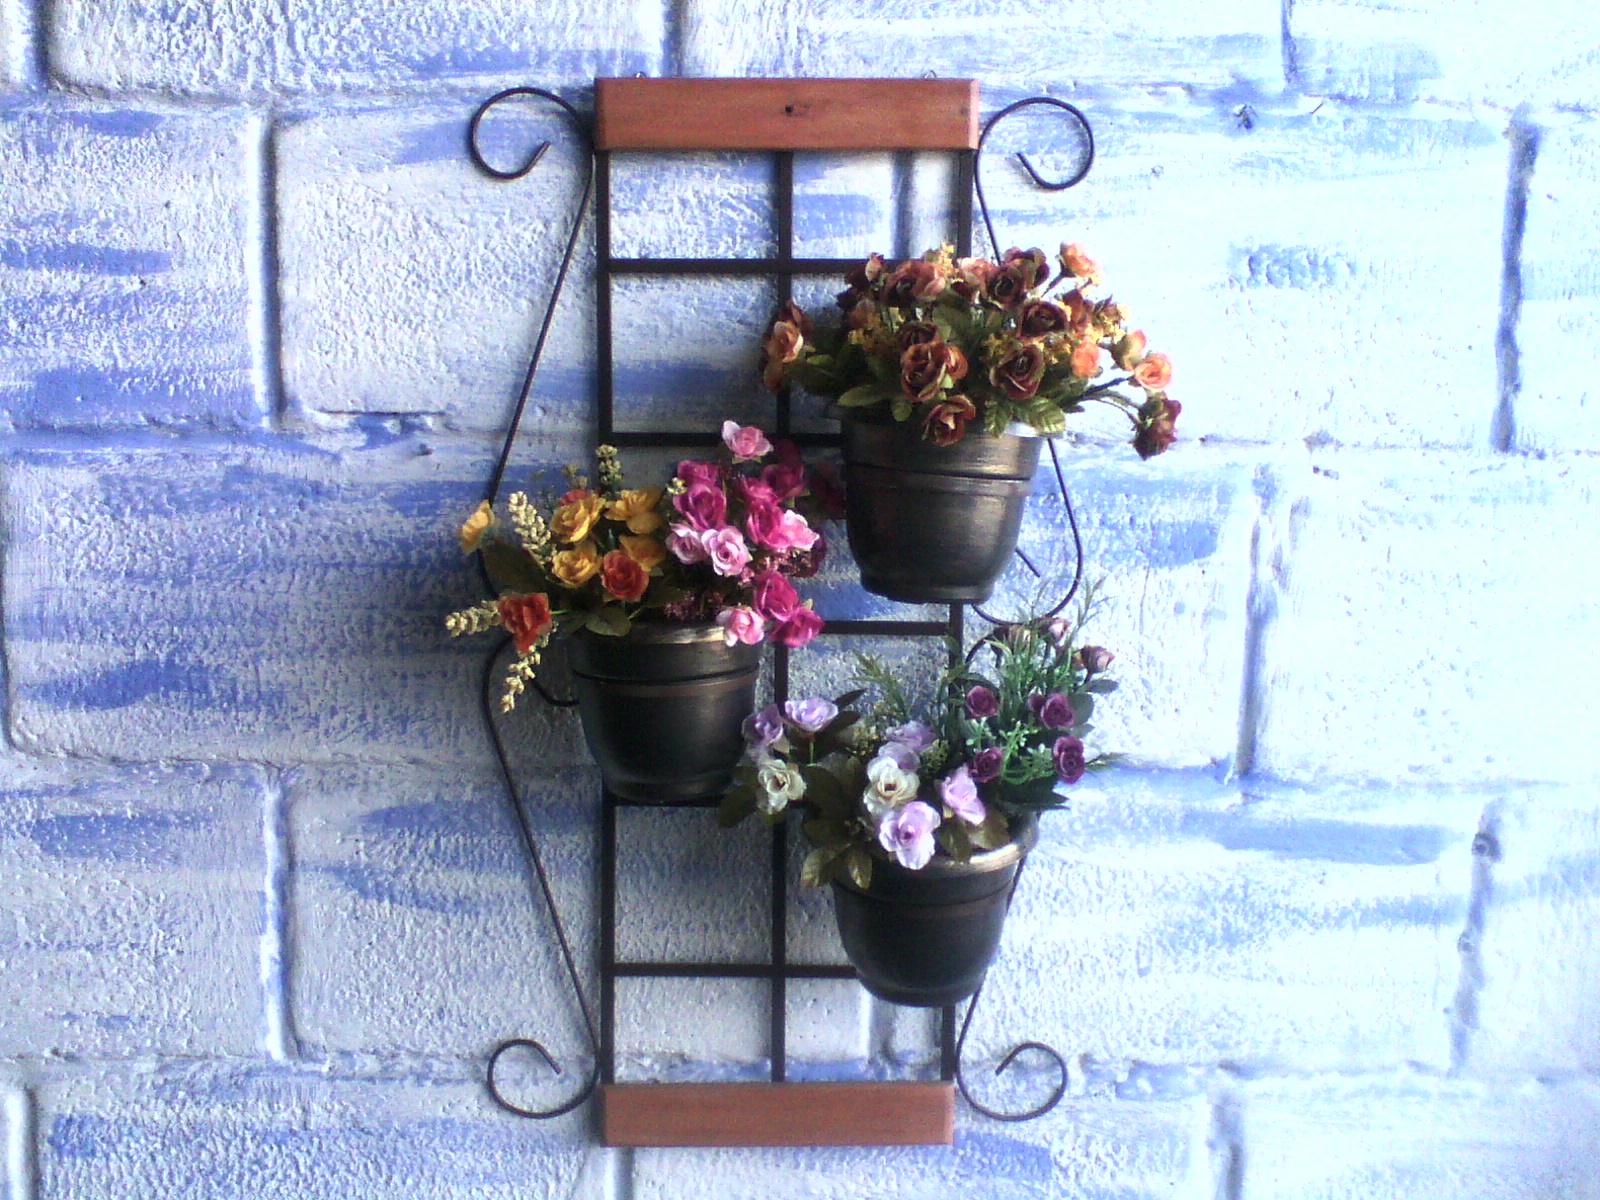 trelica jardim vertical:trelica para jardim vertical com vasos suporte trelica para jardim